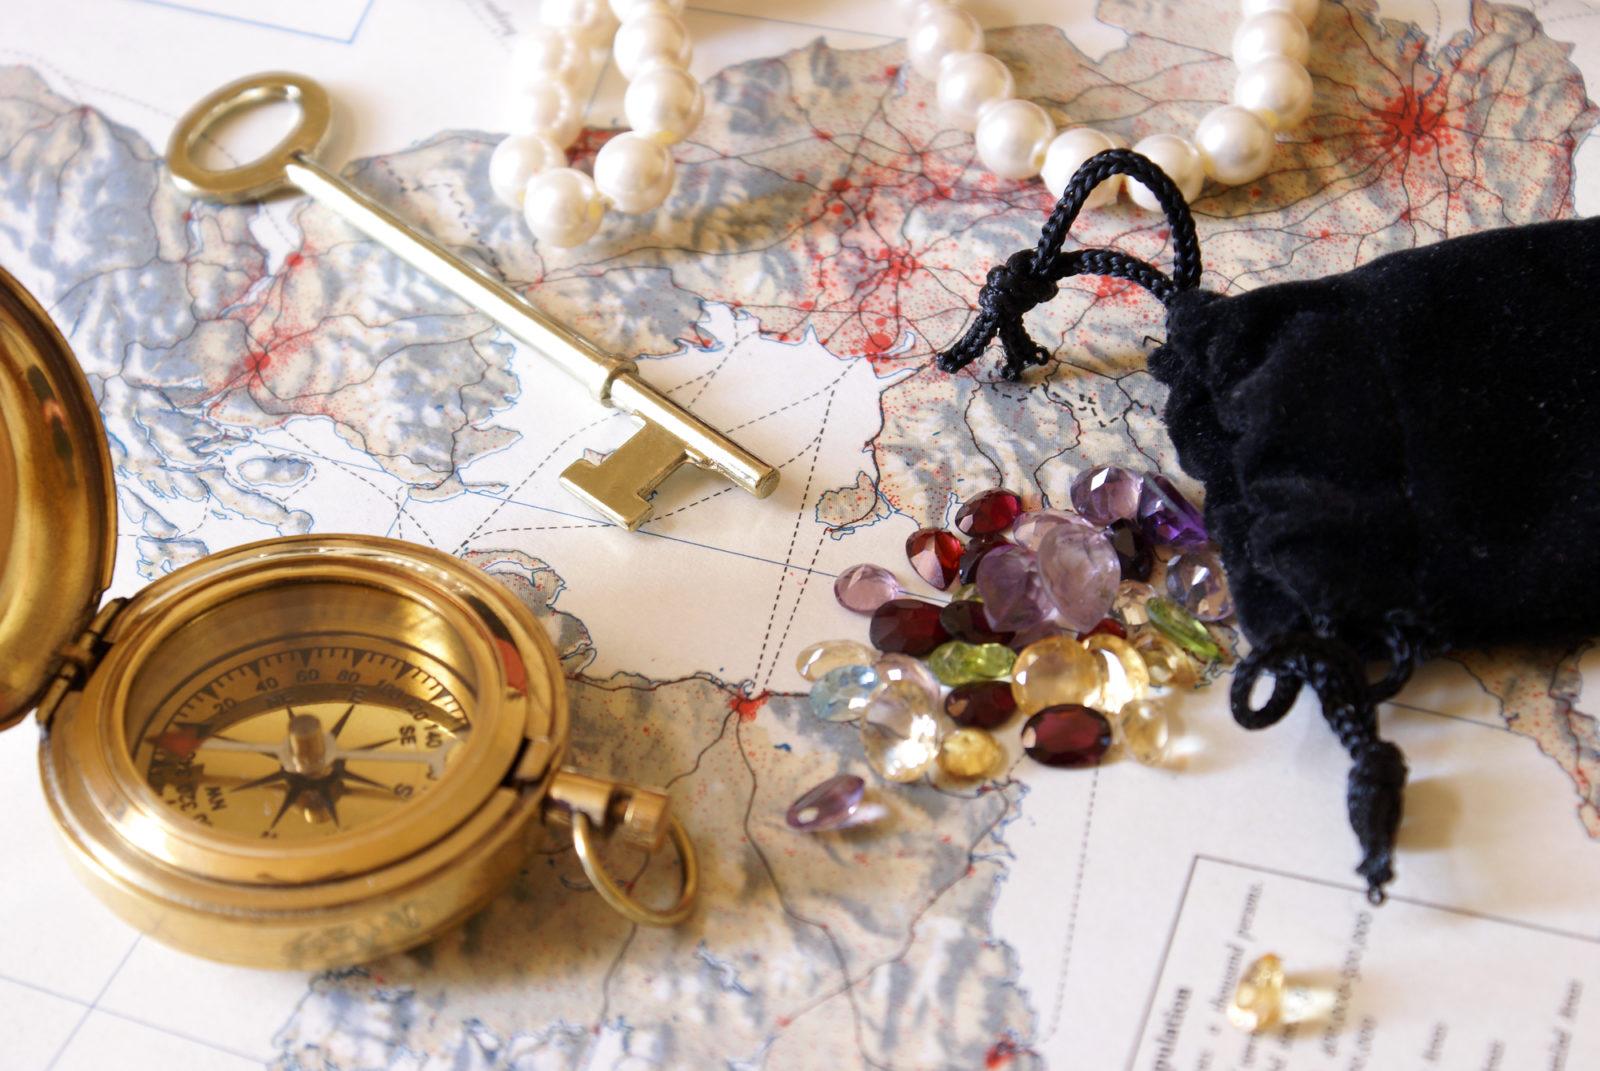 Treasure Hunt Items